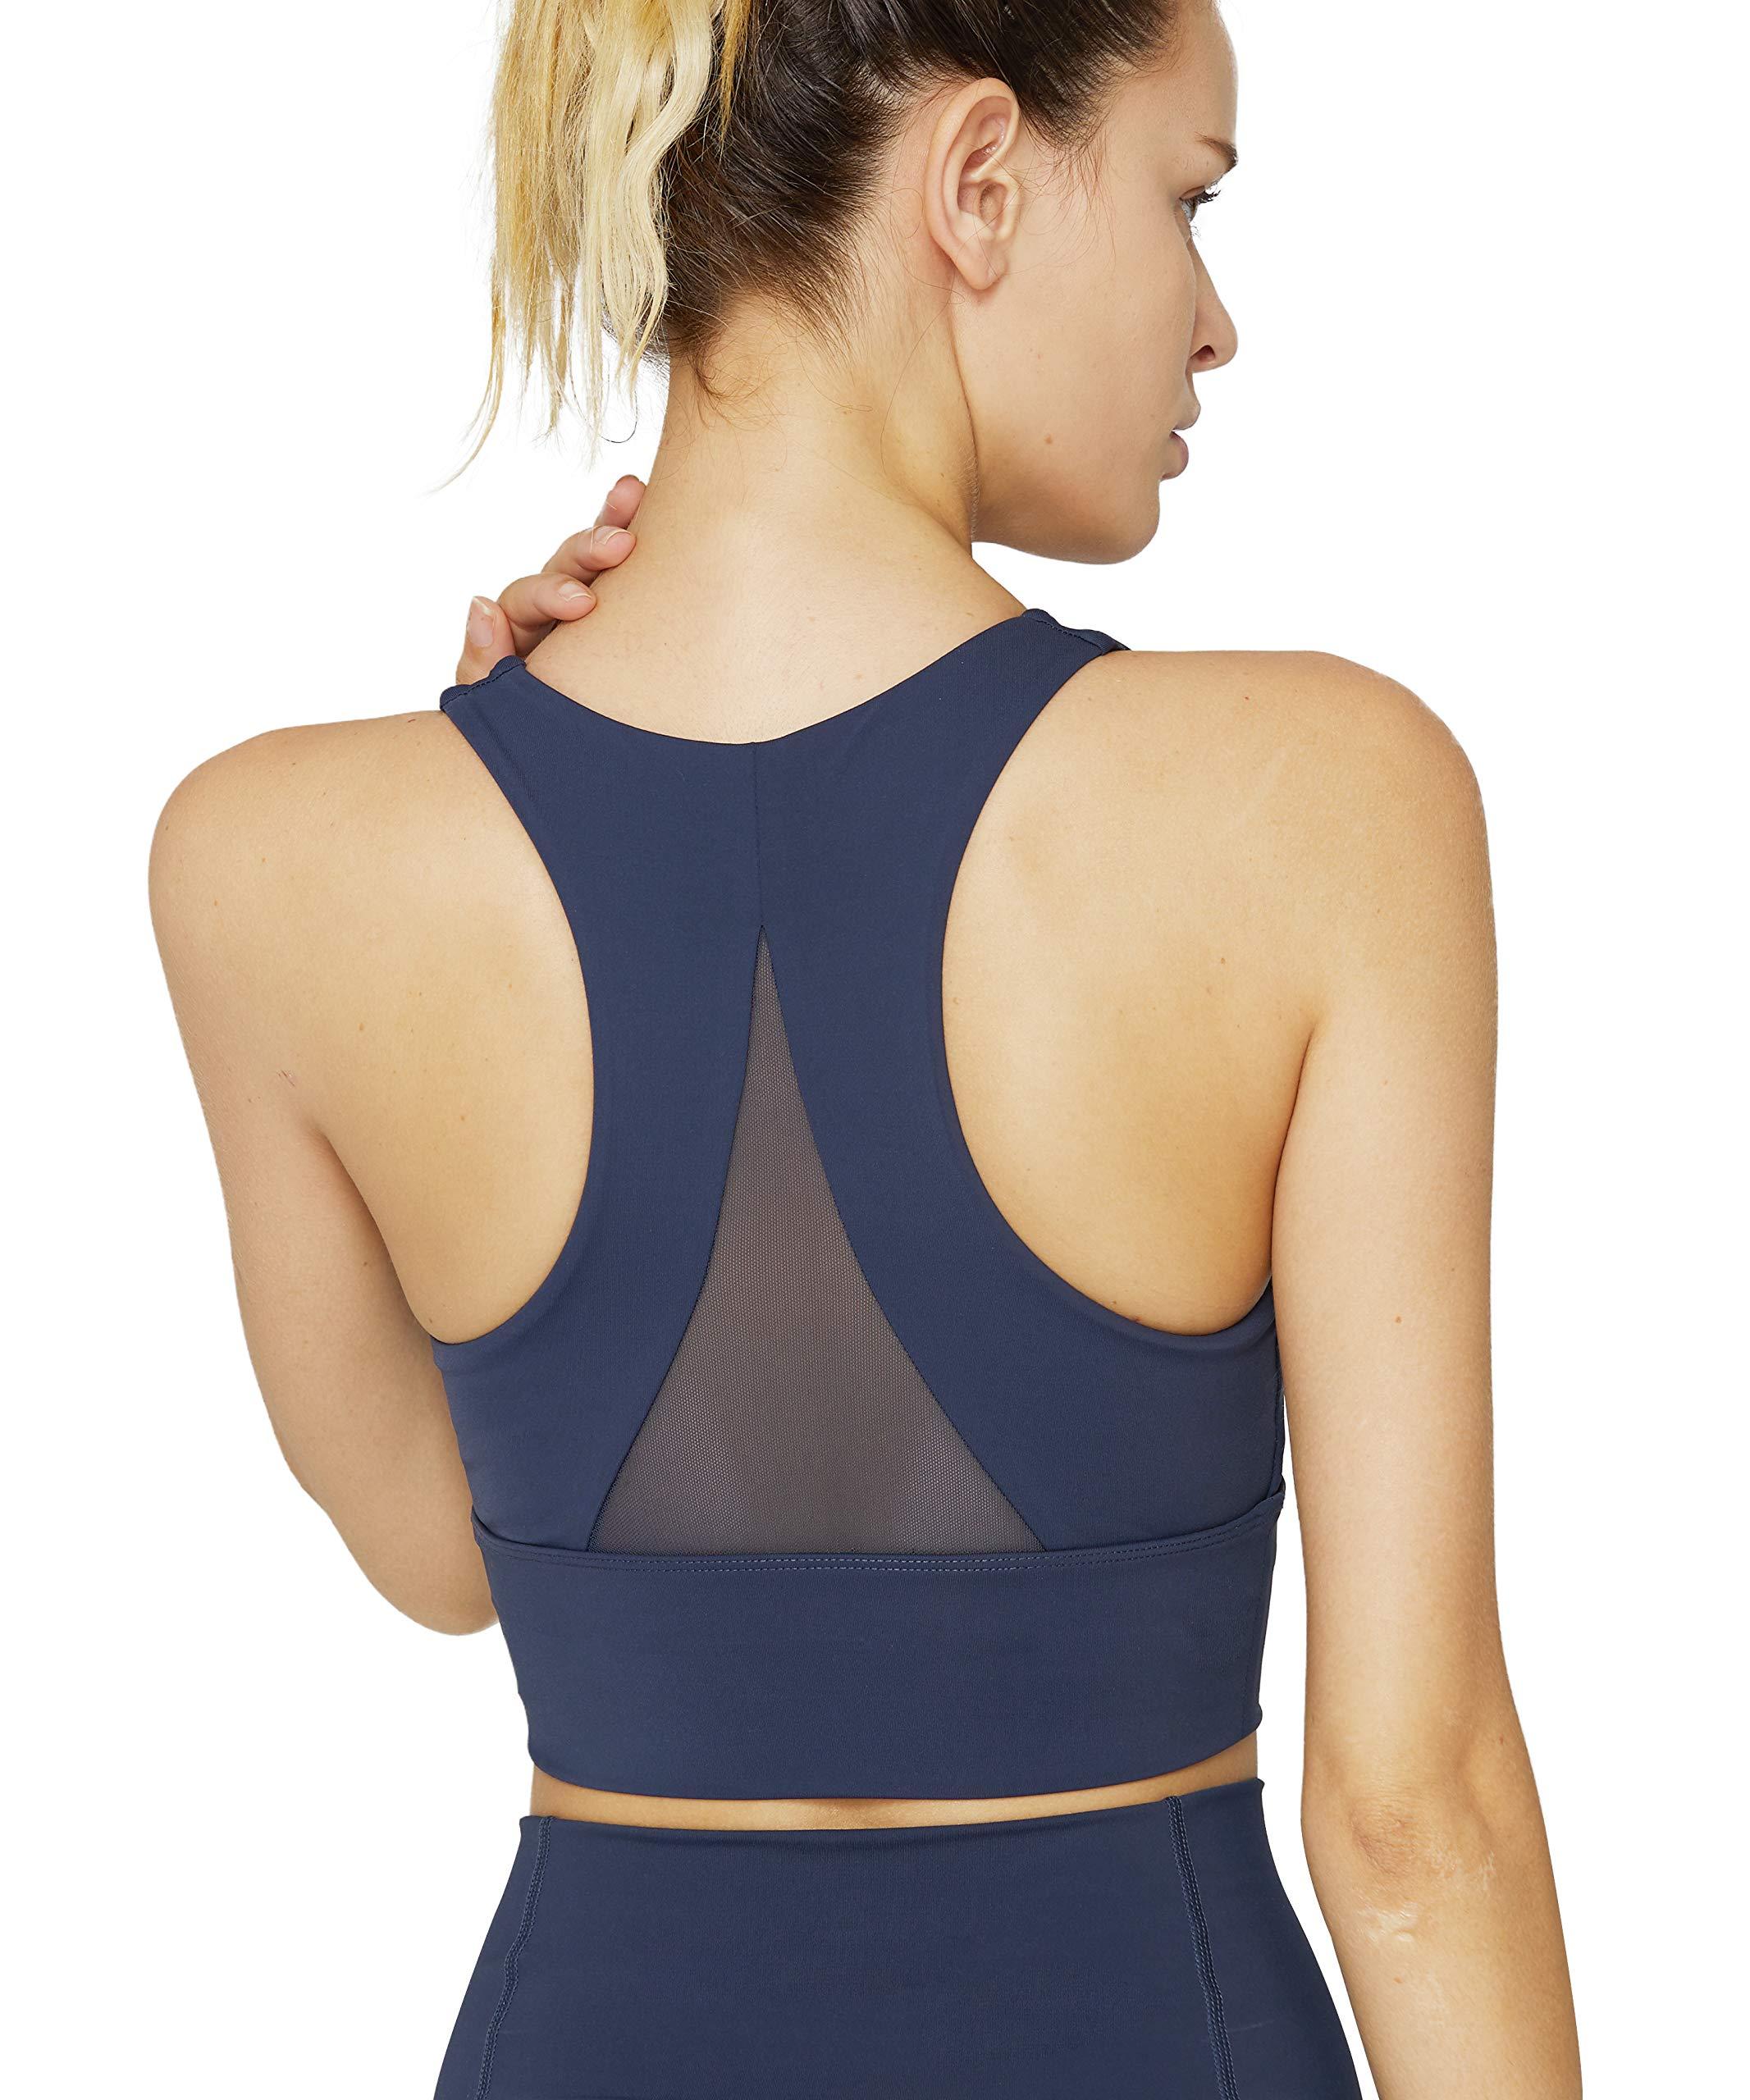 light & leaf Sports Bras for Women(XS-2X) Medium Impact Longline Yoga Workout Bra - Running Gym Activewear